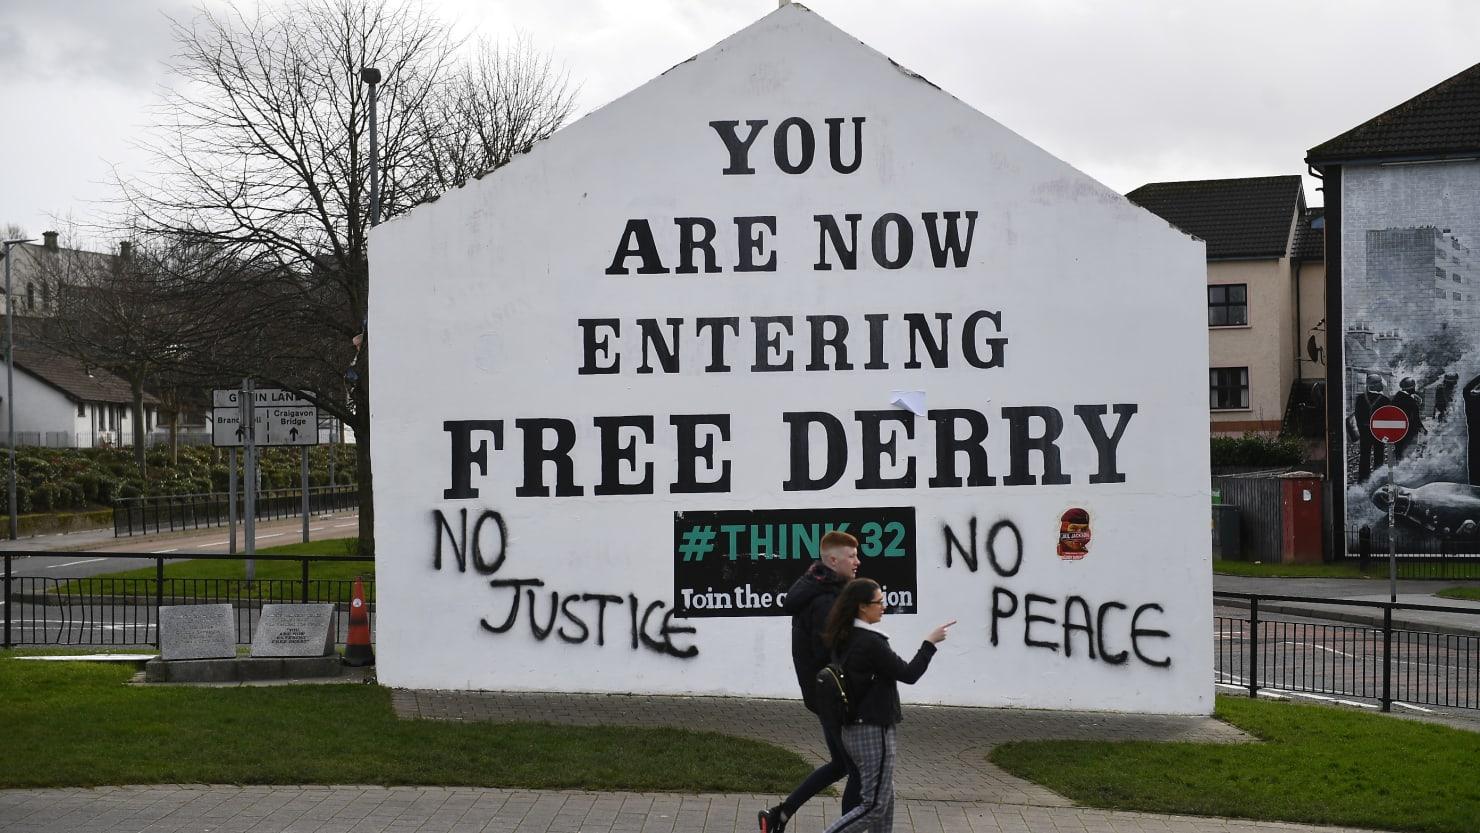 Woman Killed in 'Terrorist Incident' in Northern Ireland